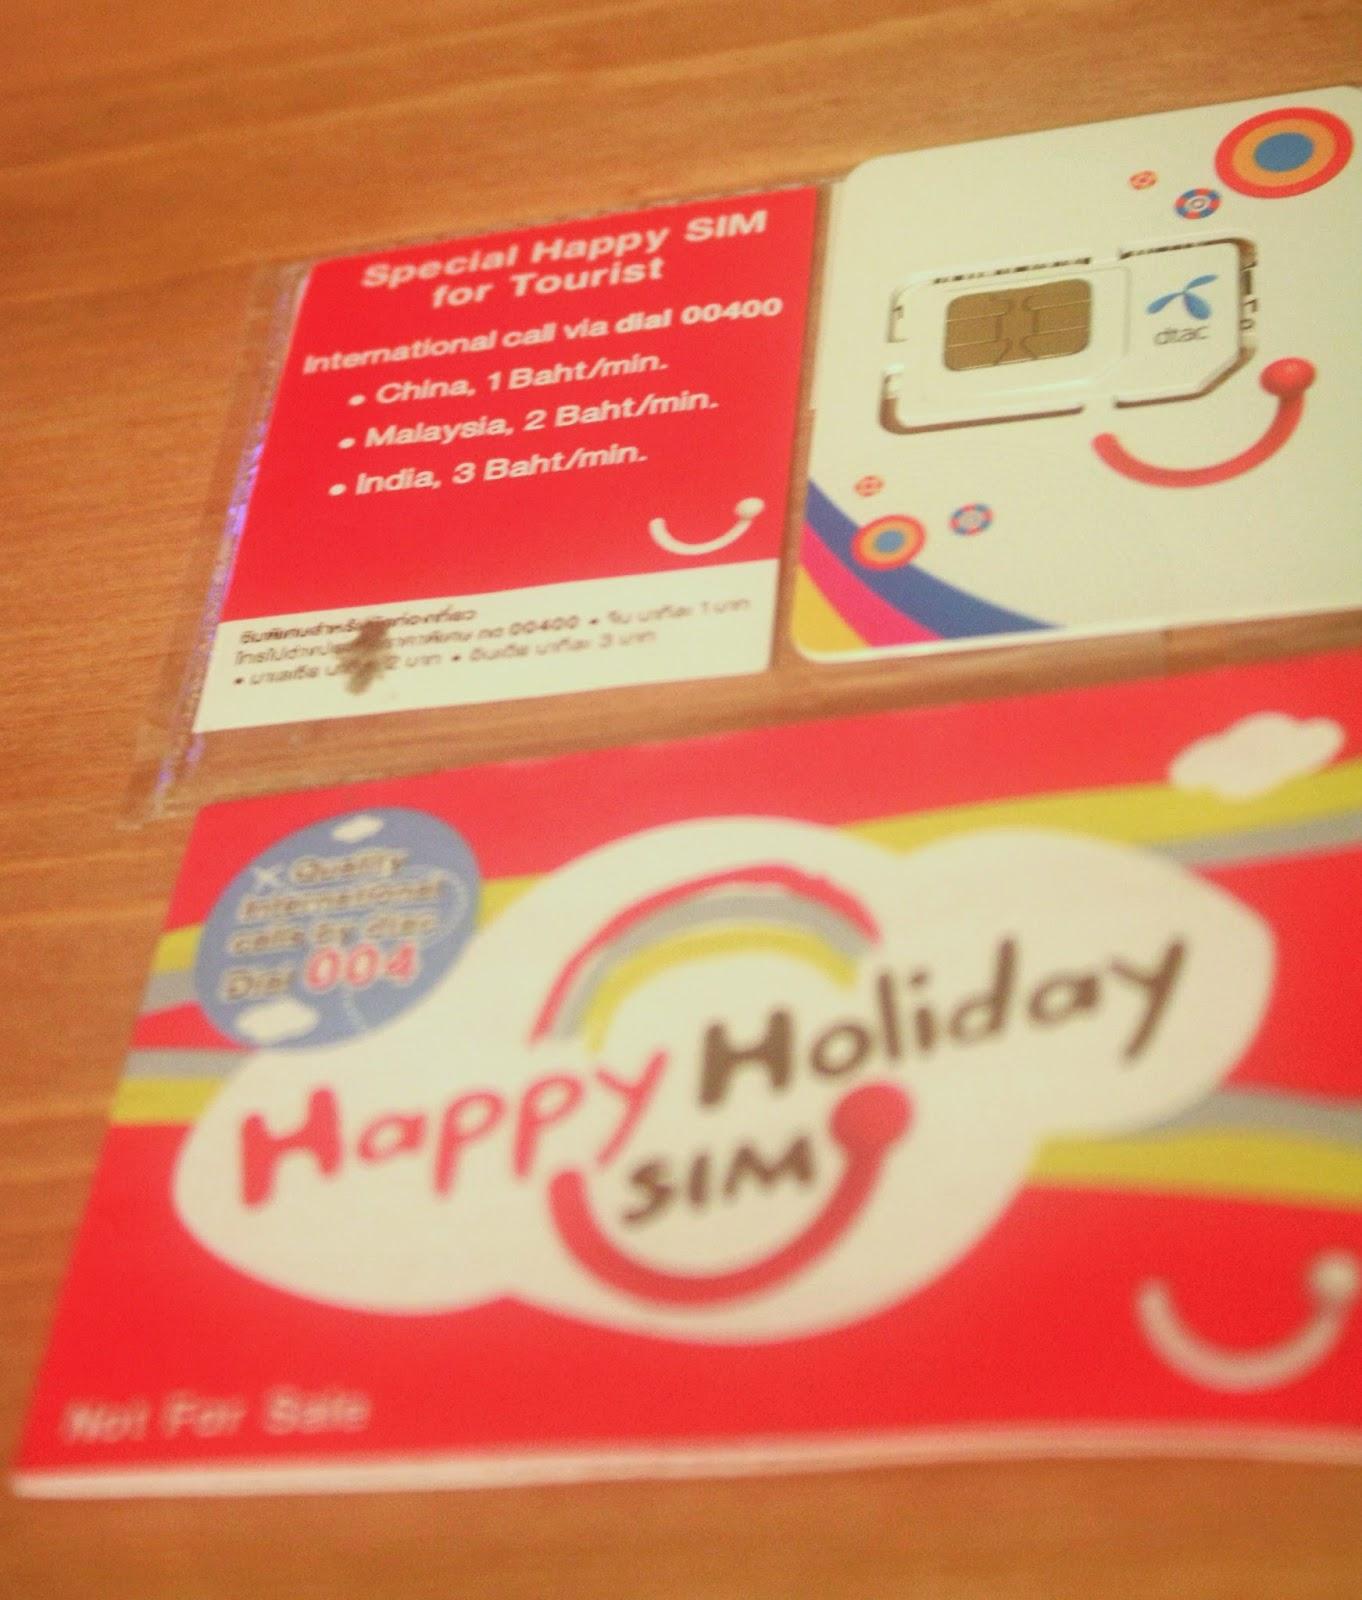 Free internet sim card / Winklevoss zwillinge